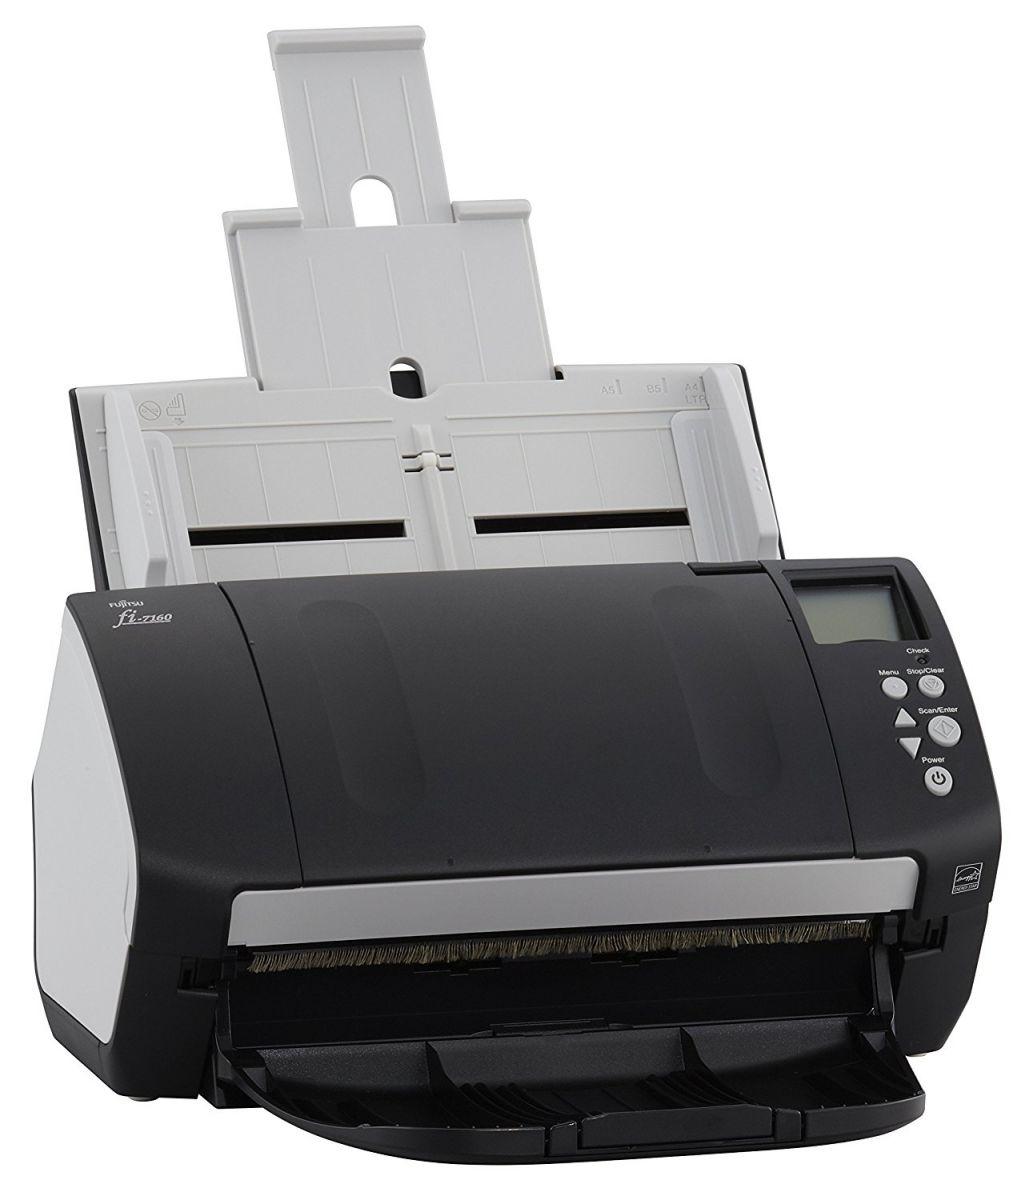 fujitsu-scanner-fi-7160